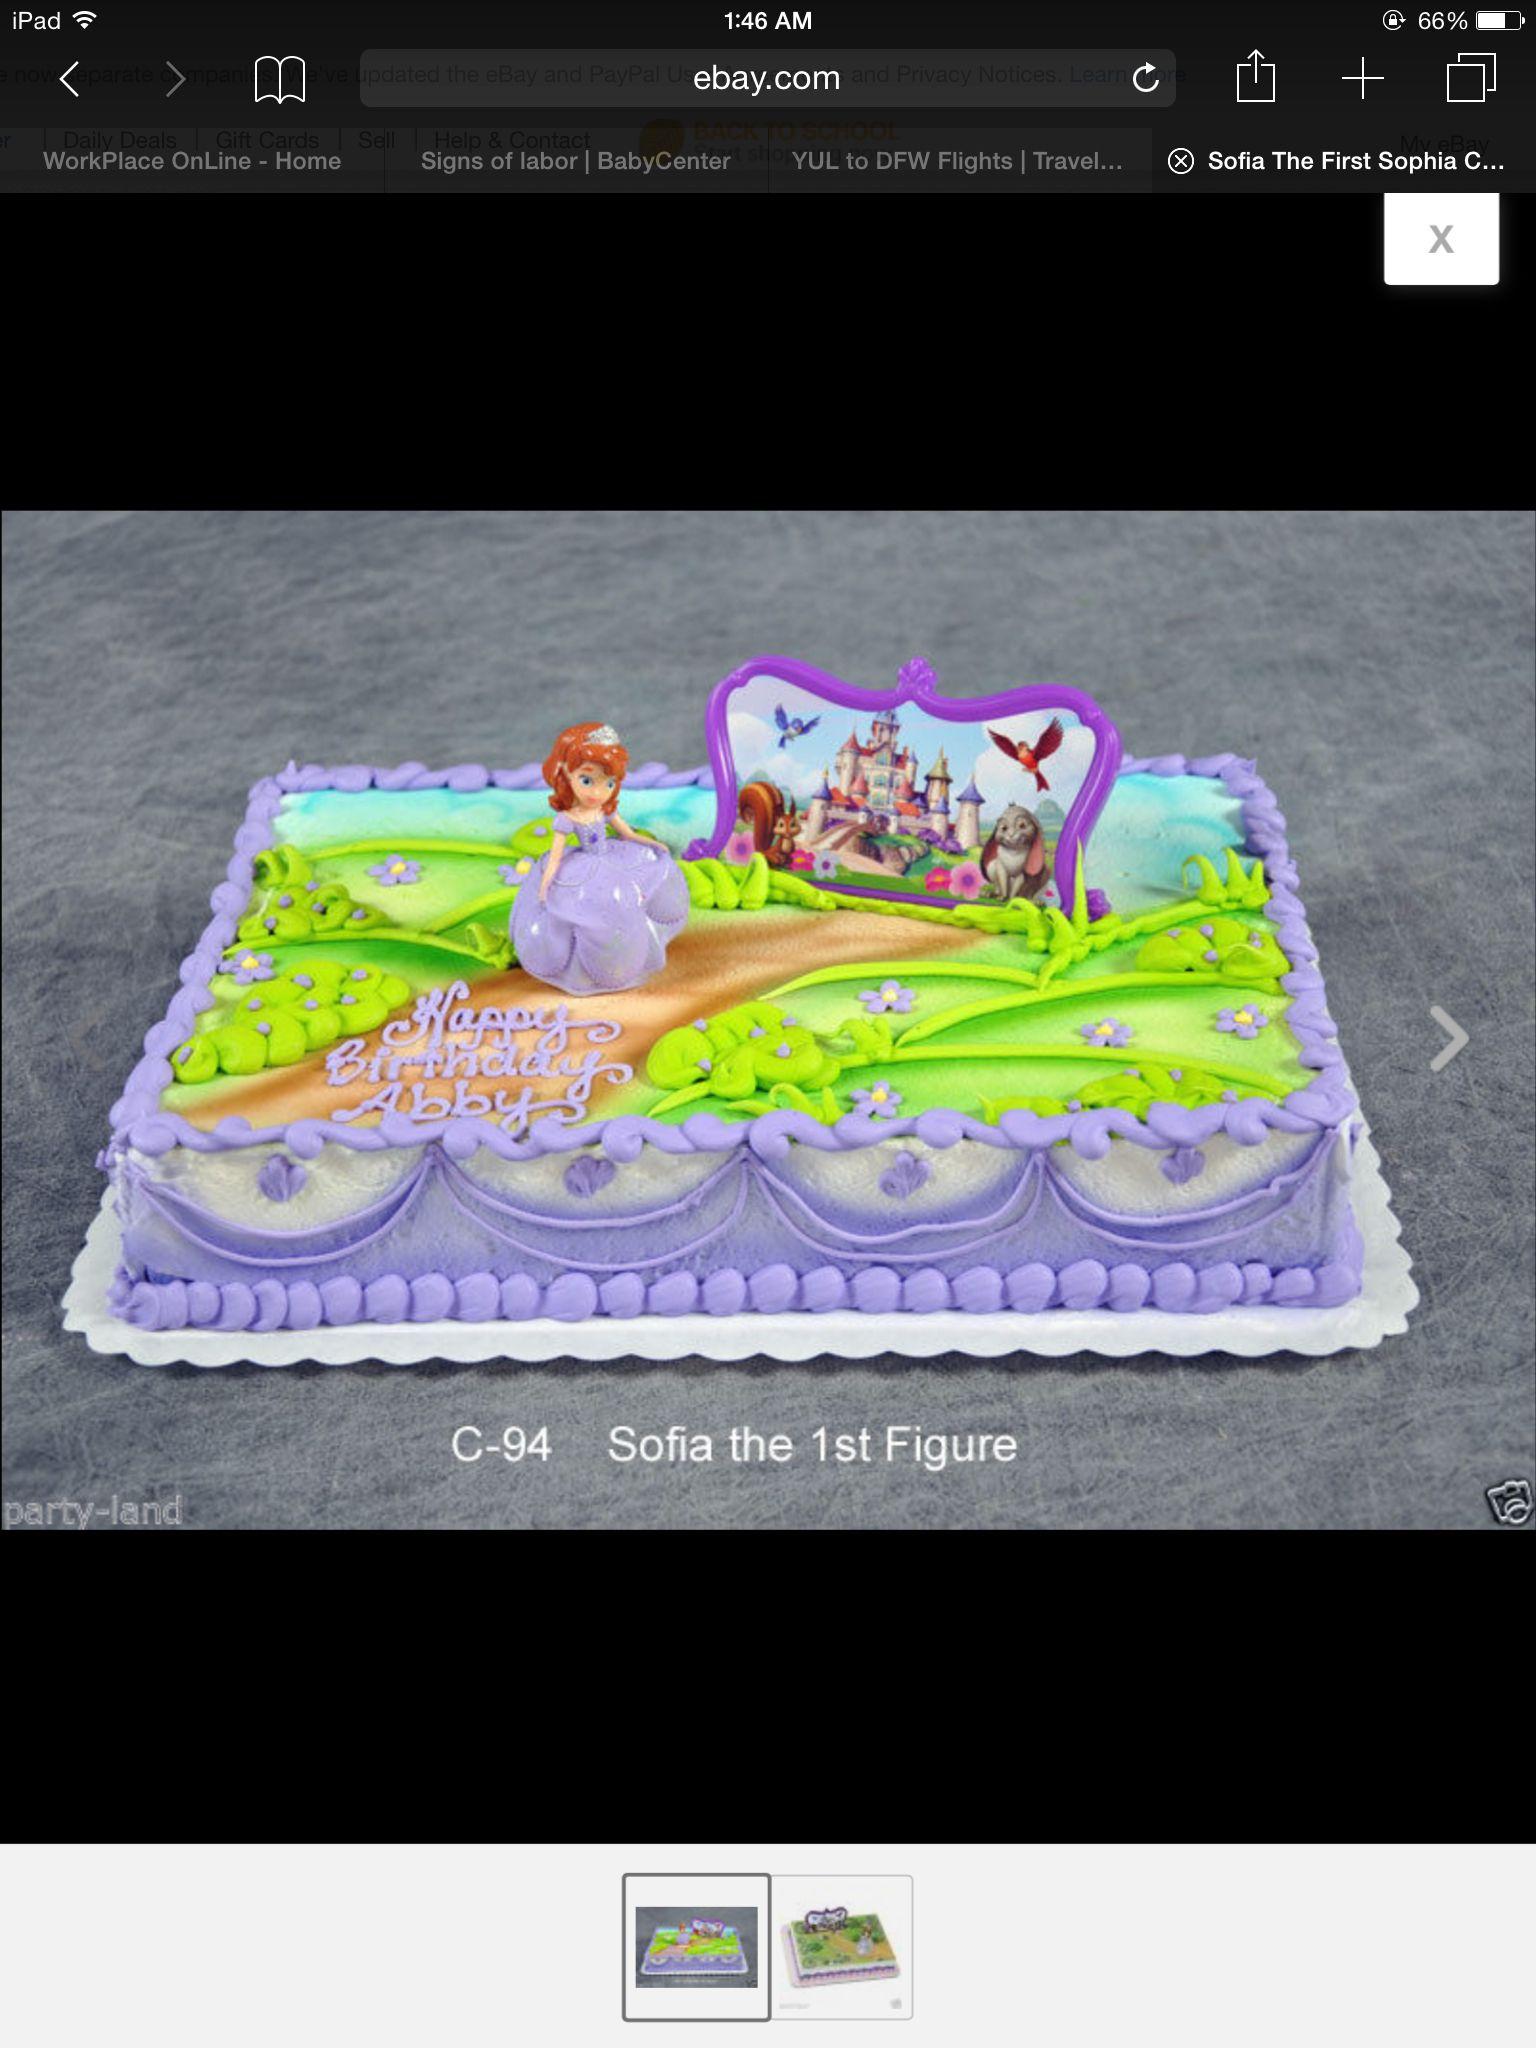 sofia the first birthday cake | kaya | pinterest | birthday cakes, Presentation templates